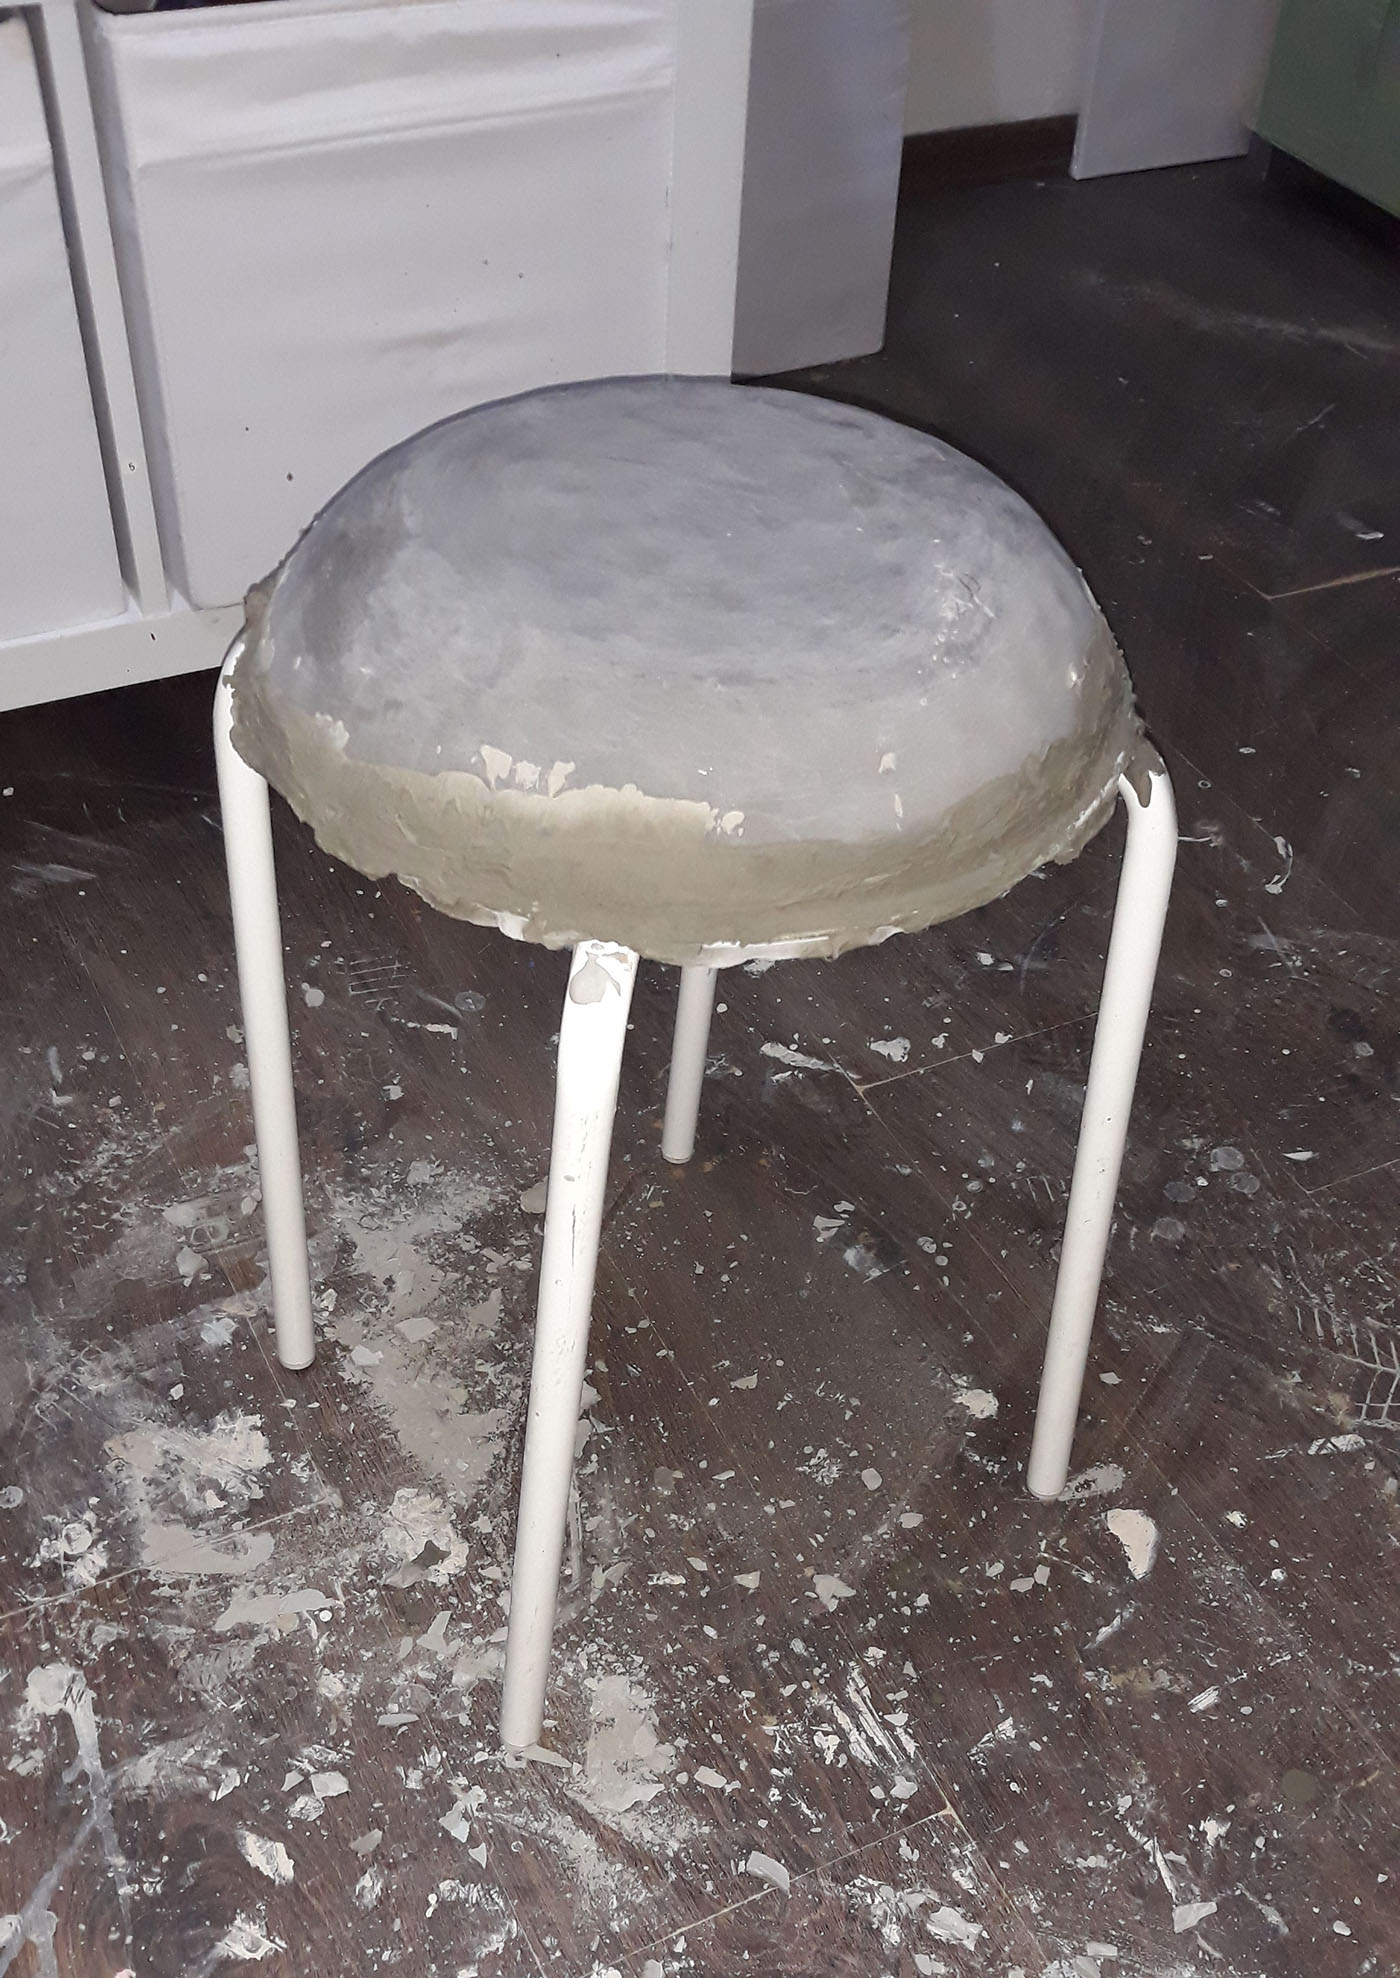 IMG 20190626 WA0008 - רהיטים קטנים ממלט